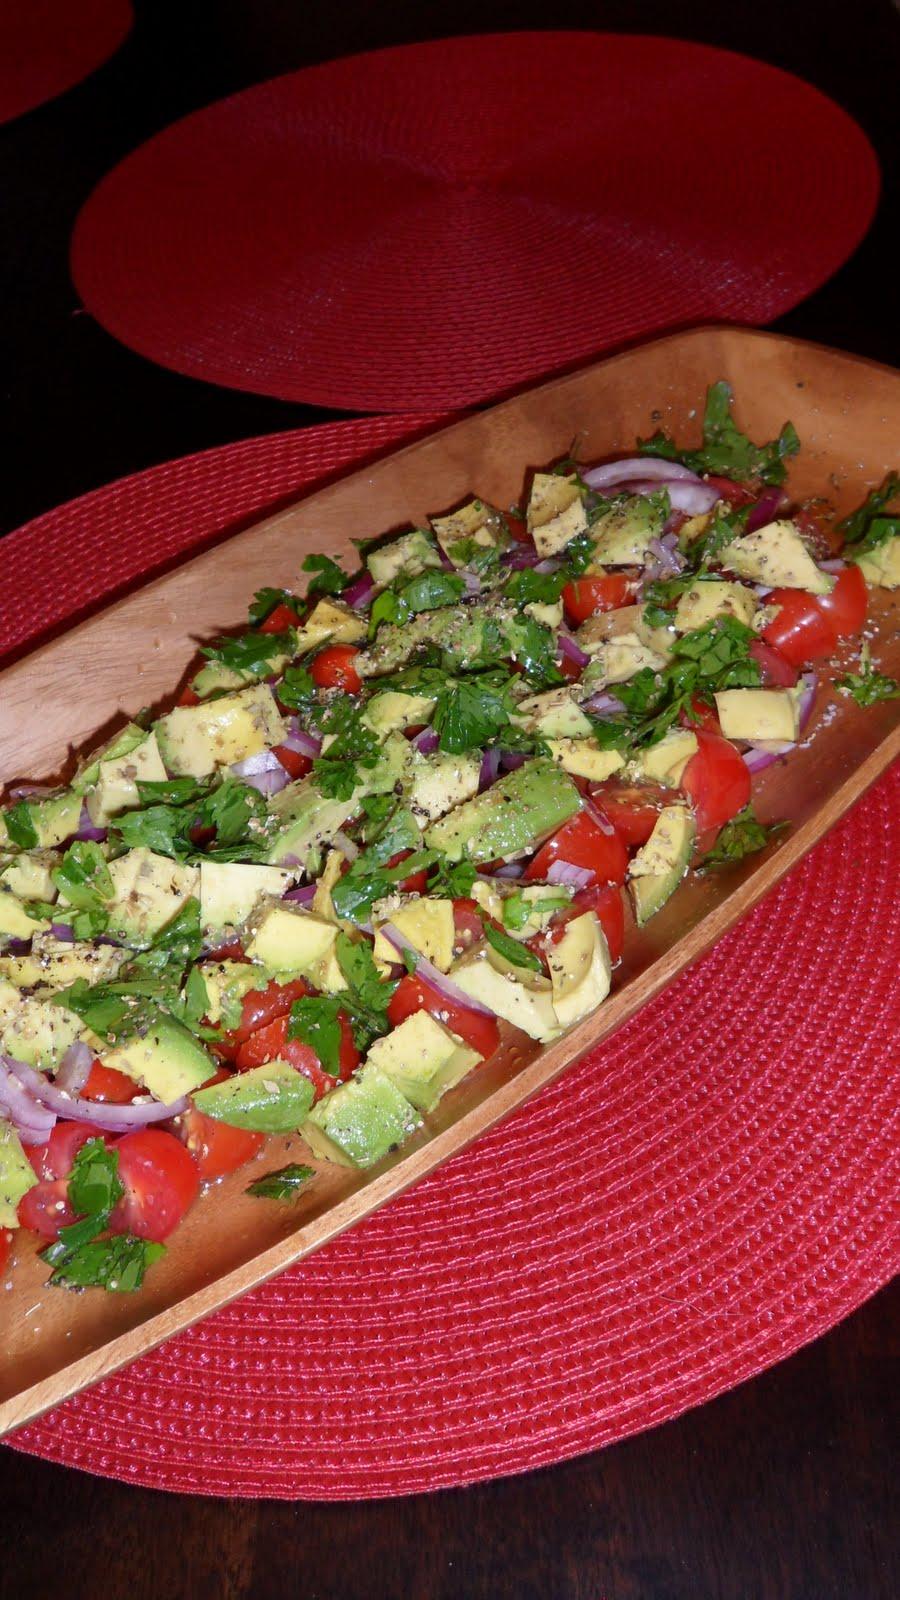 Random Acts of Food: Tomato, Onion & Avocado Salad